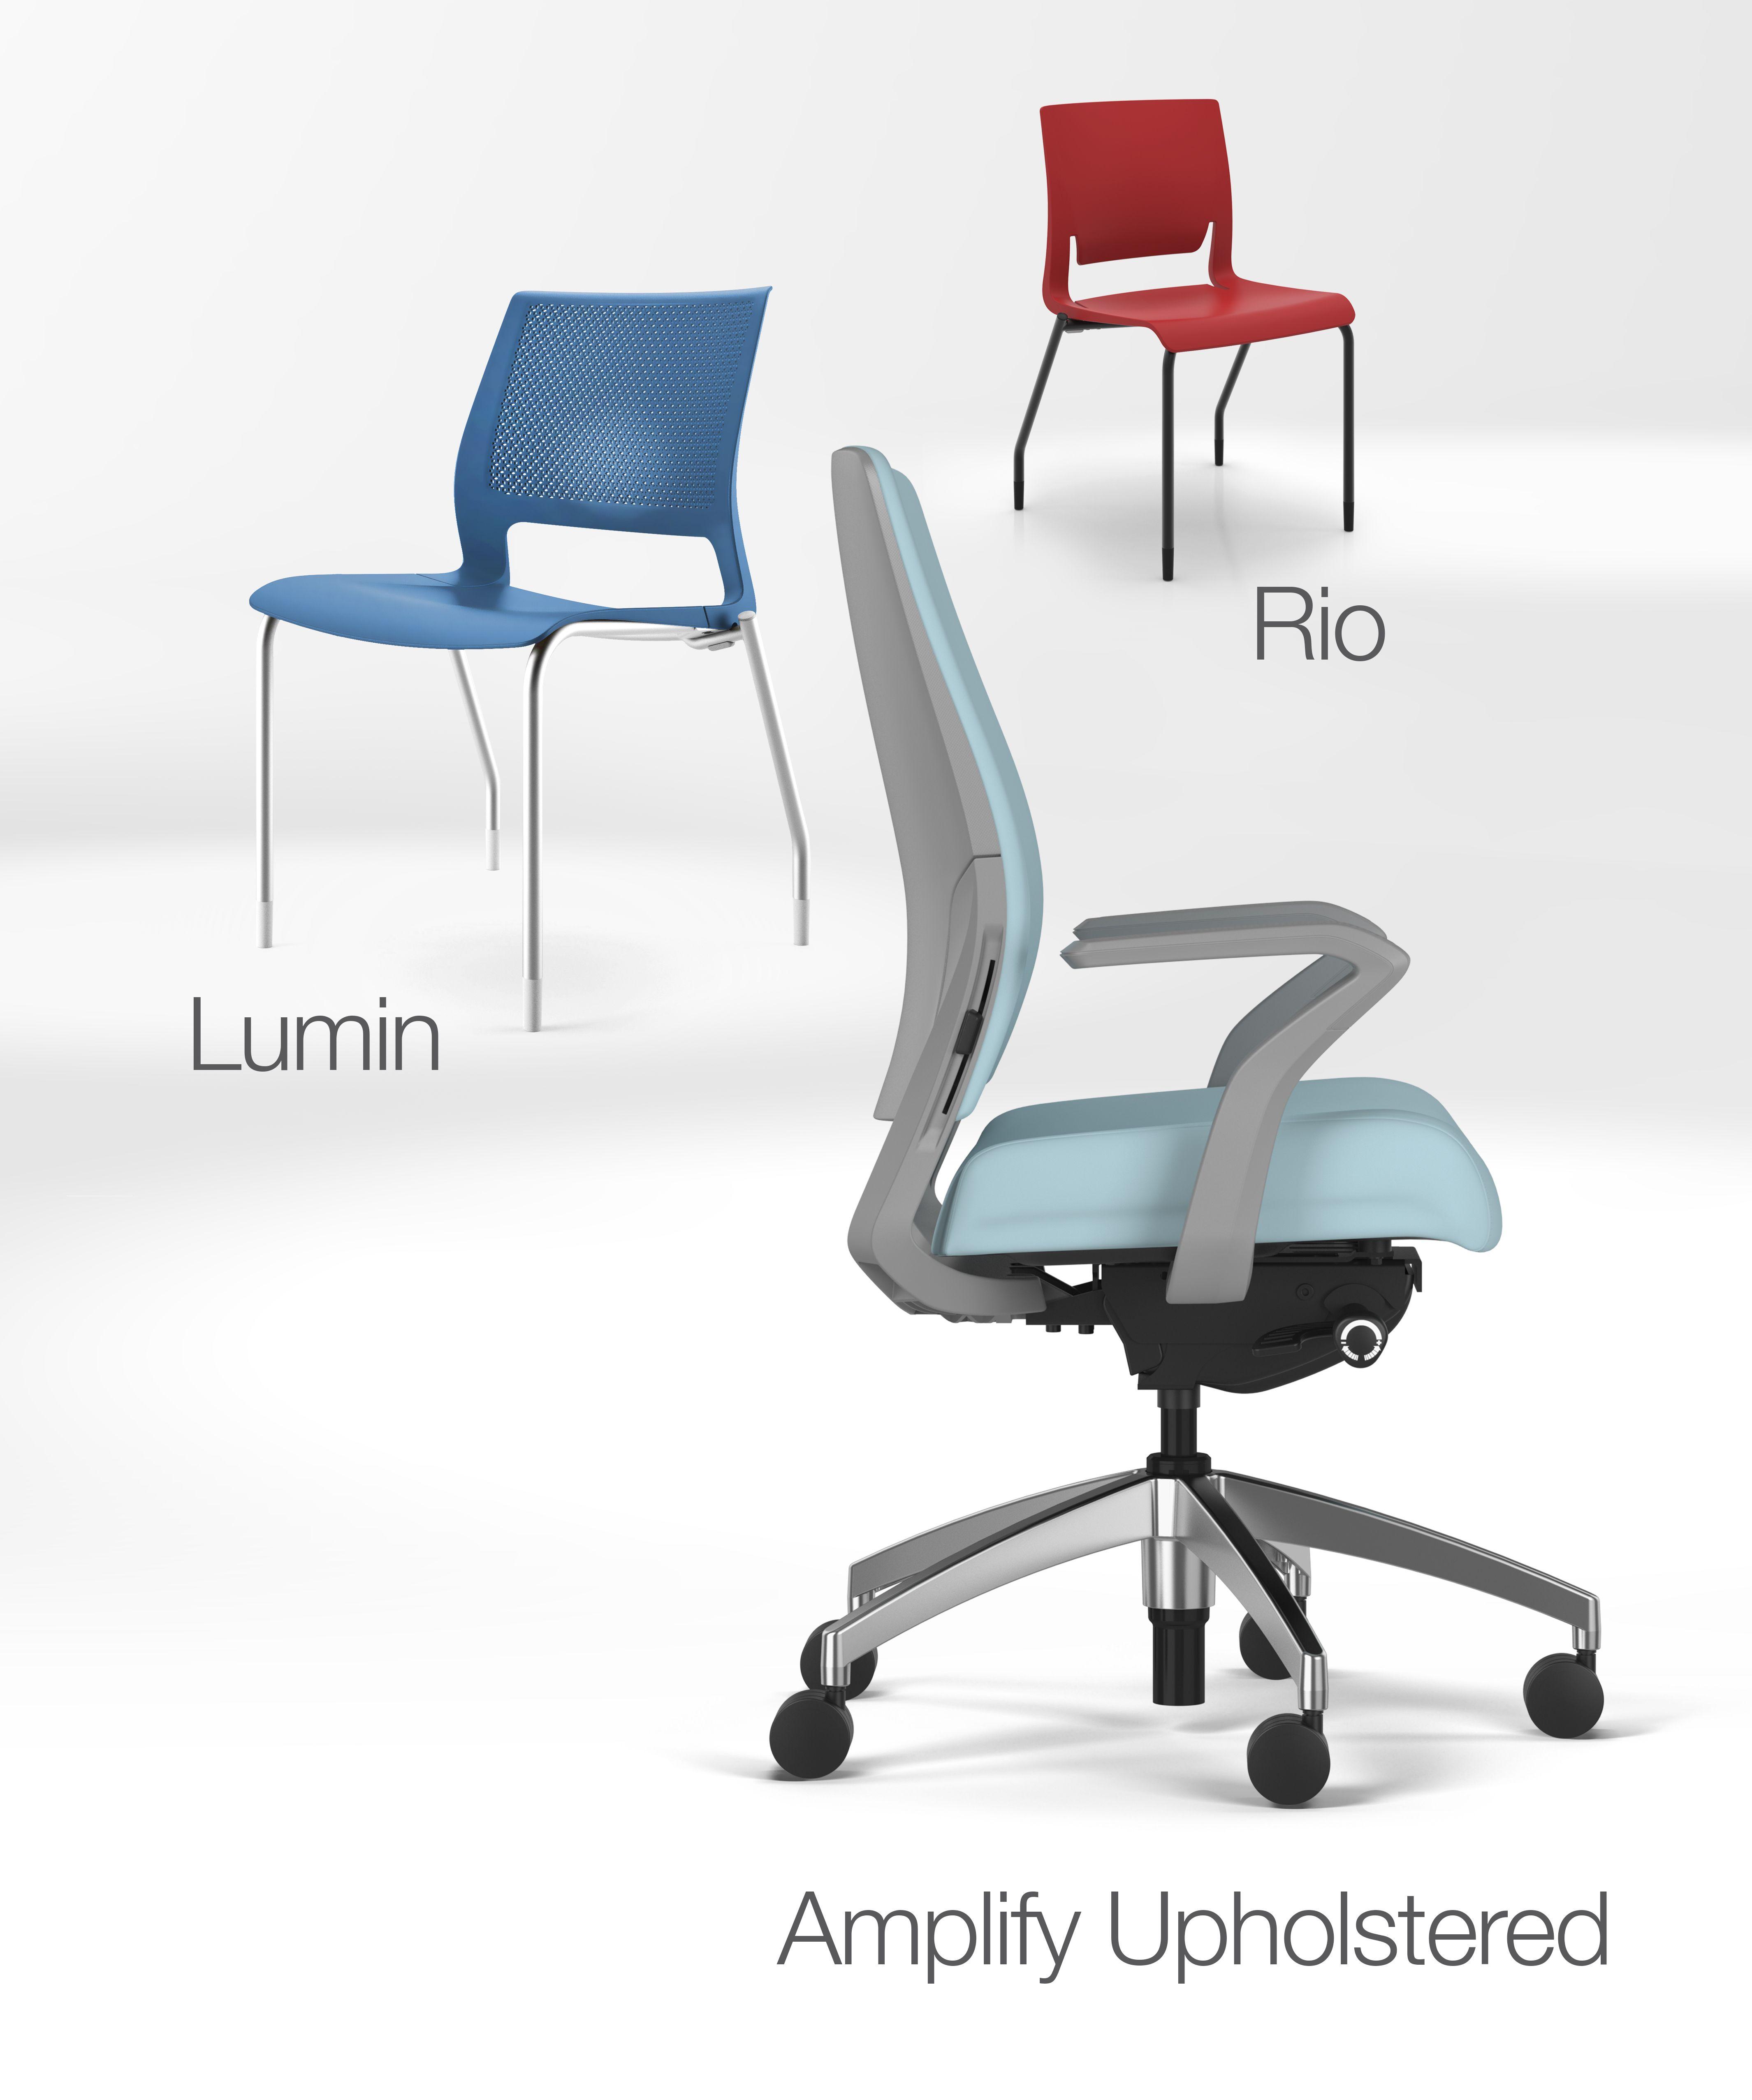 Superb Soi Rio Lumin Amplify Upholstered Neocon2015 Beatyapartments Chair Design Images Beatyapartmentscom